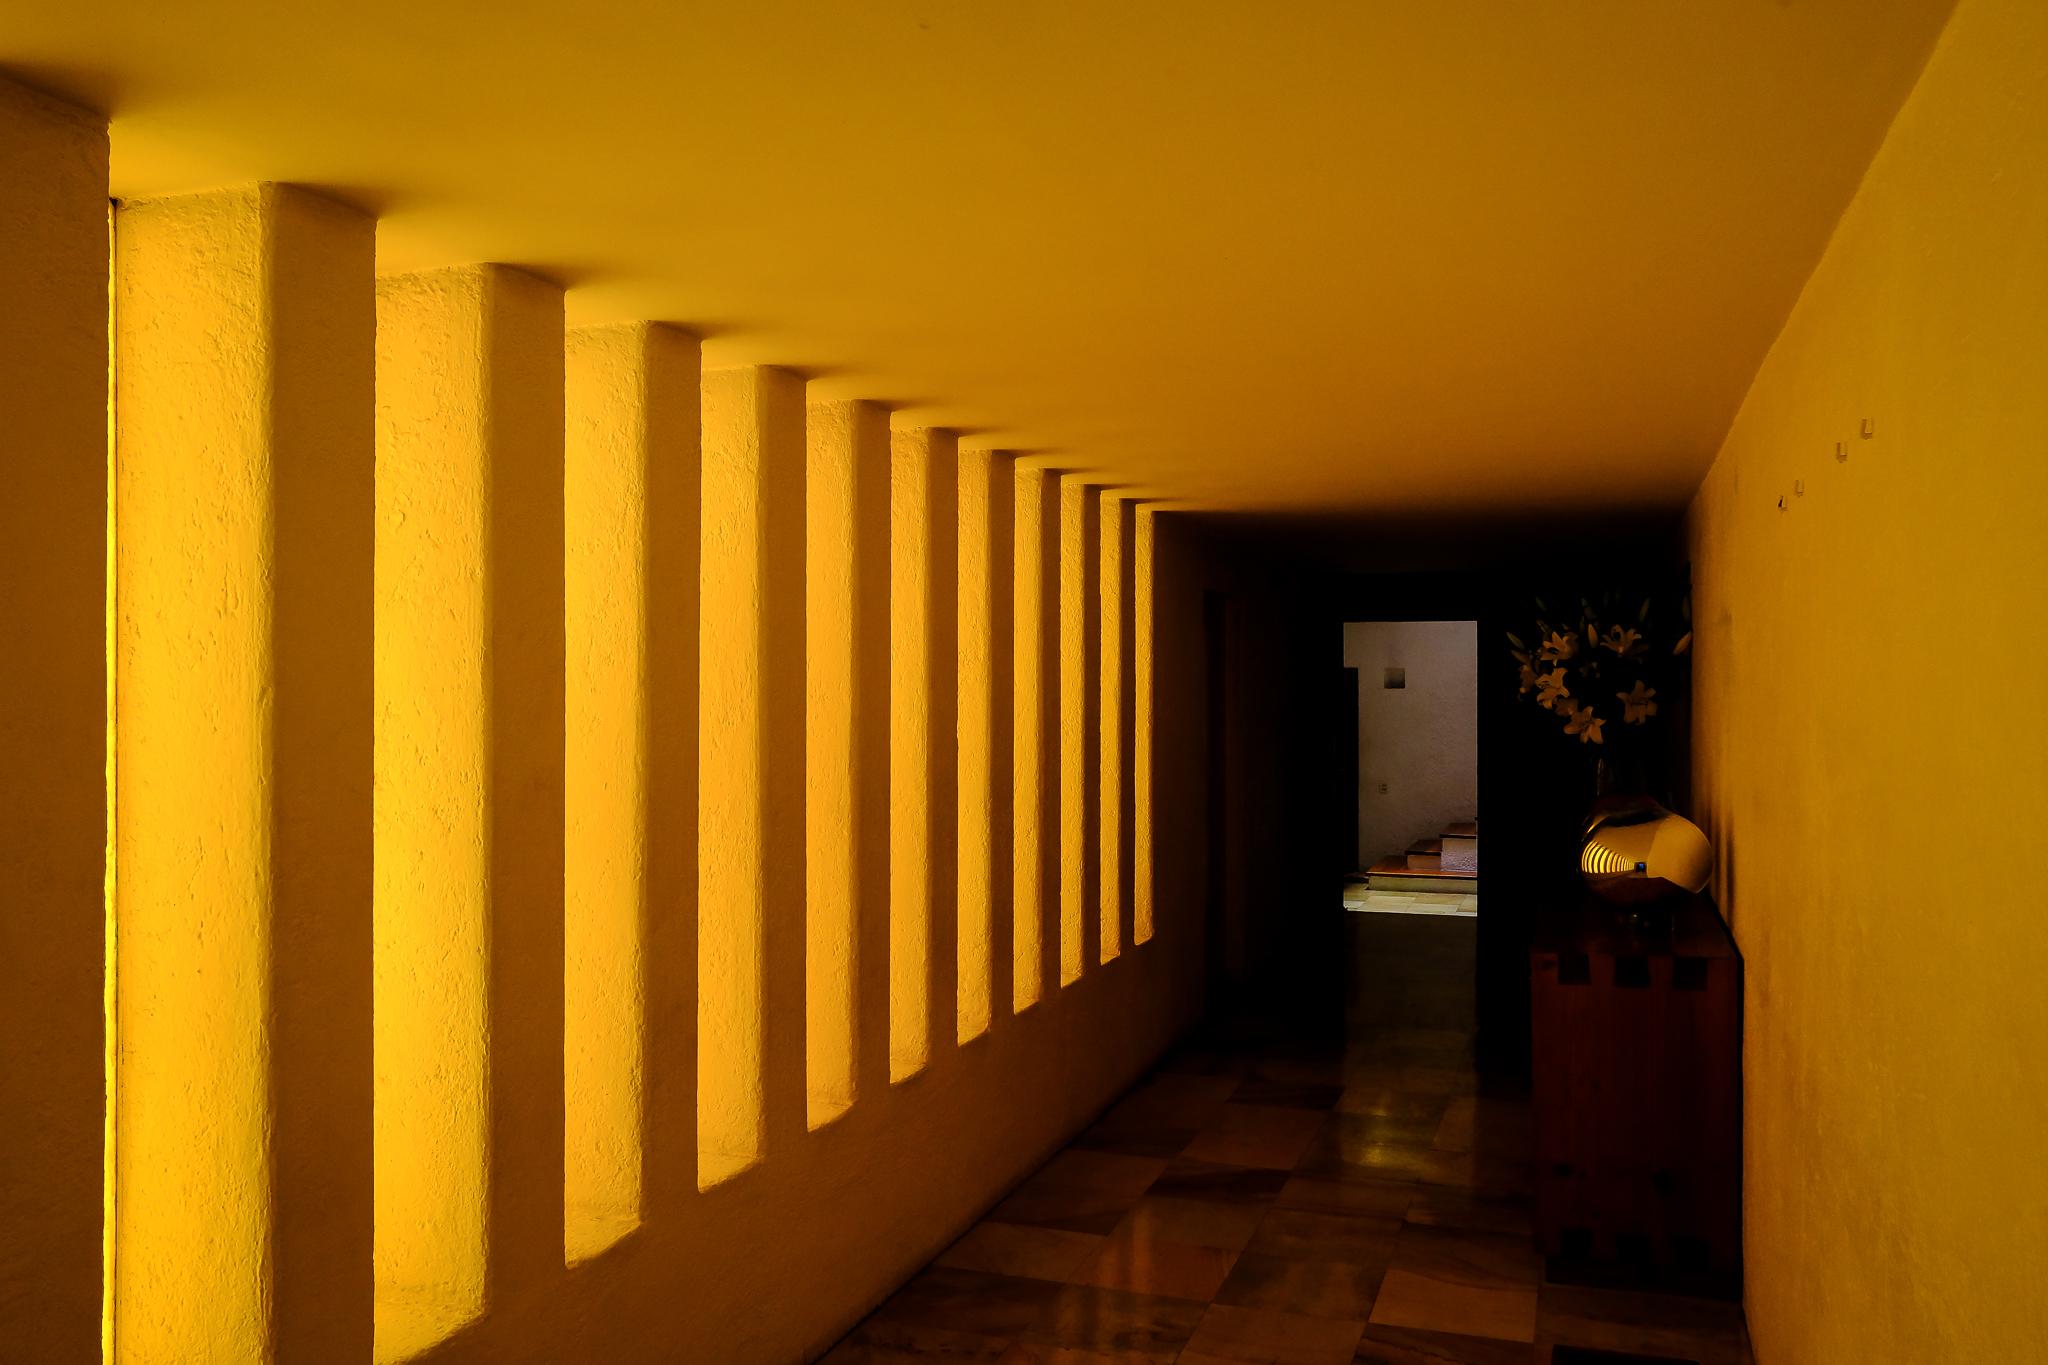 http://s3.amazonaws.com/images.horgandesignbuild.com/blog/DSCF1714.jpg